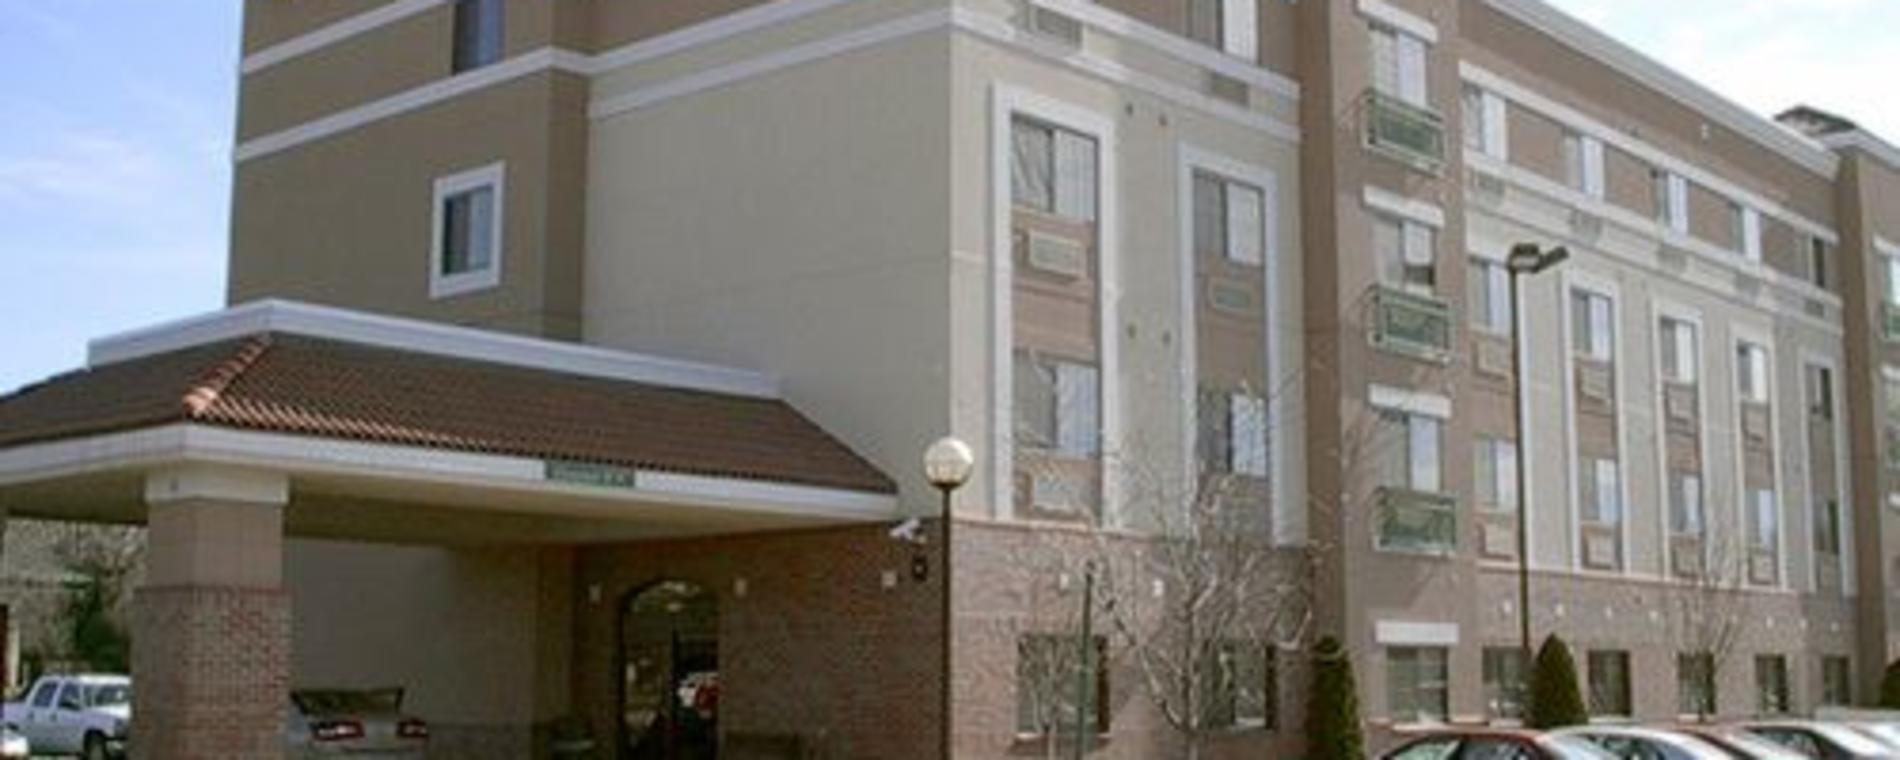 Wesley Inn exterior Visit Wichita